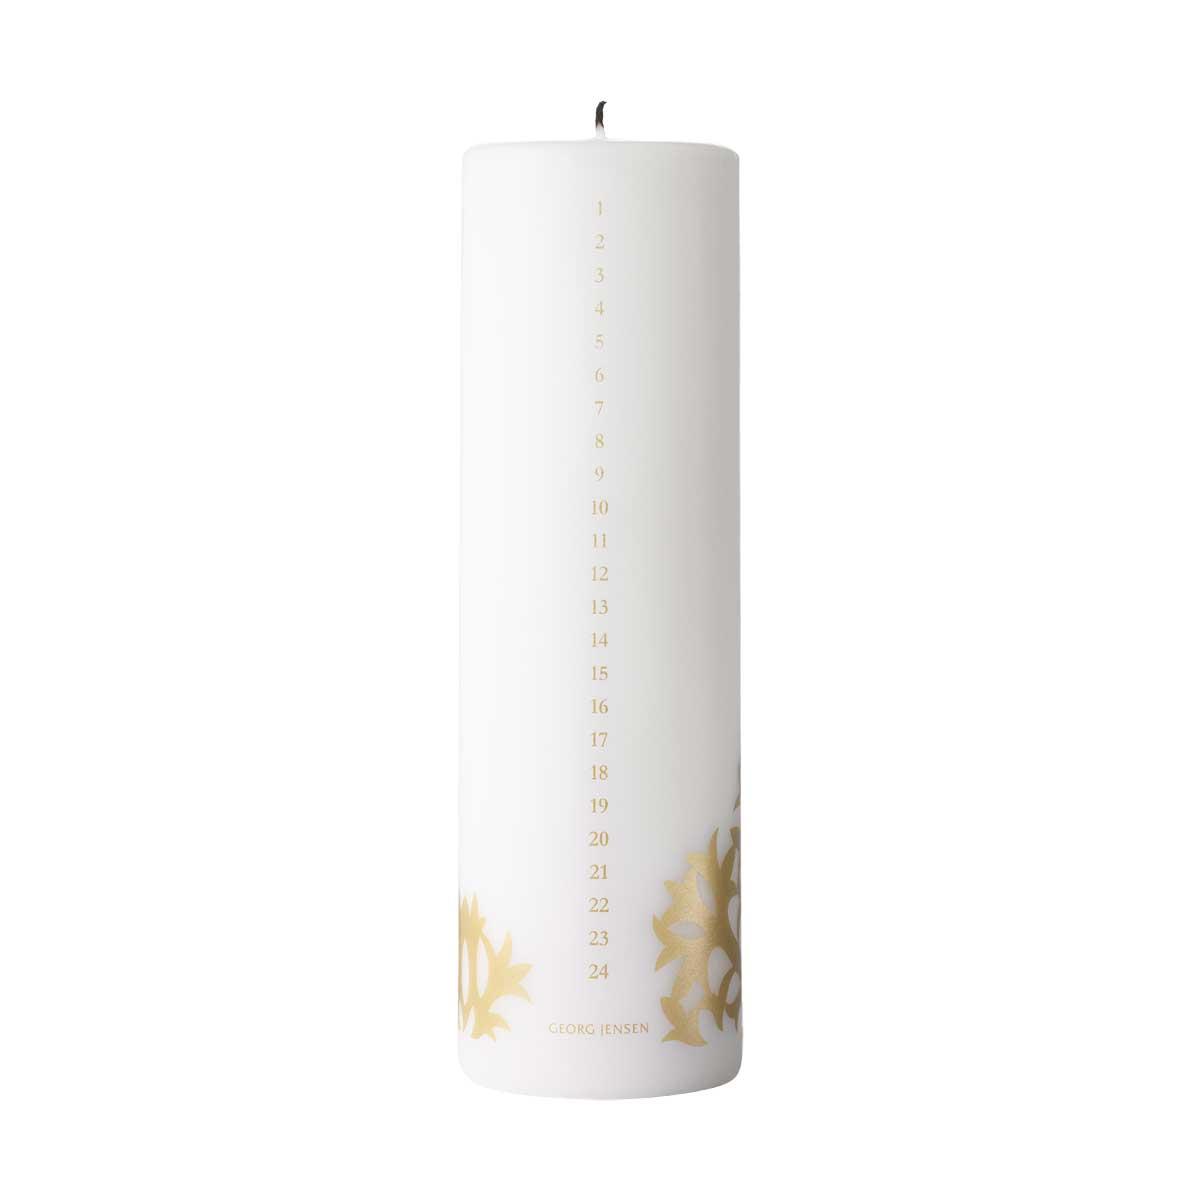 pack 10017722 cc 2020 calendar candle gold